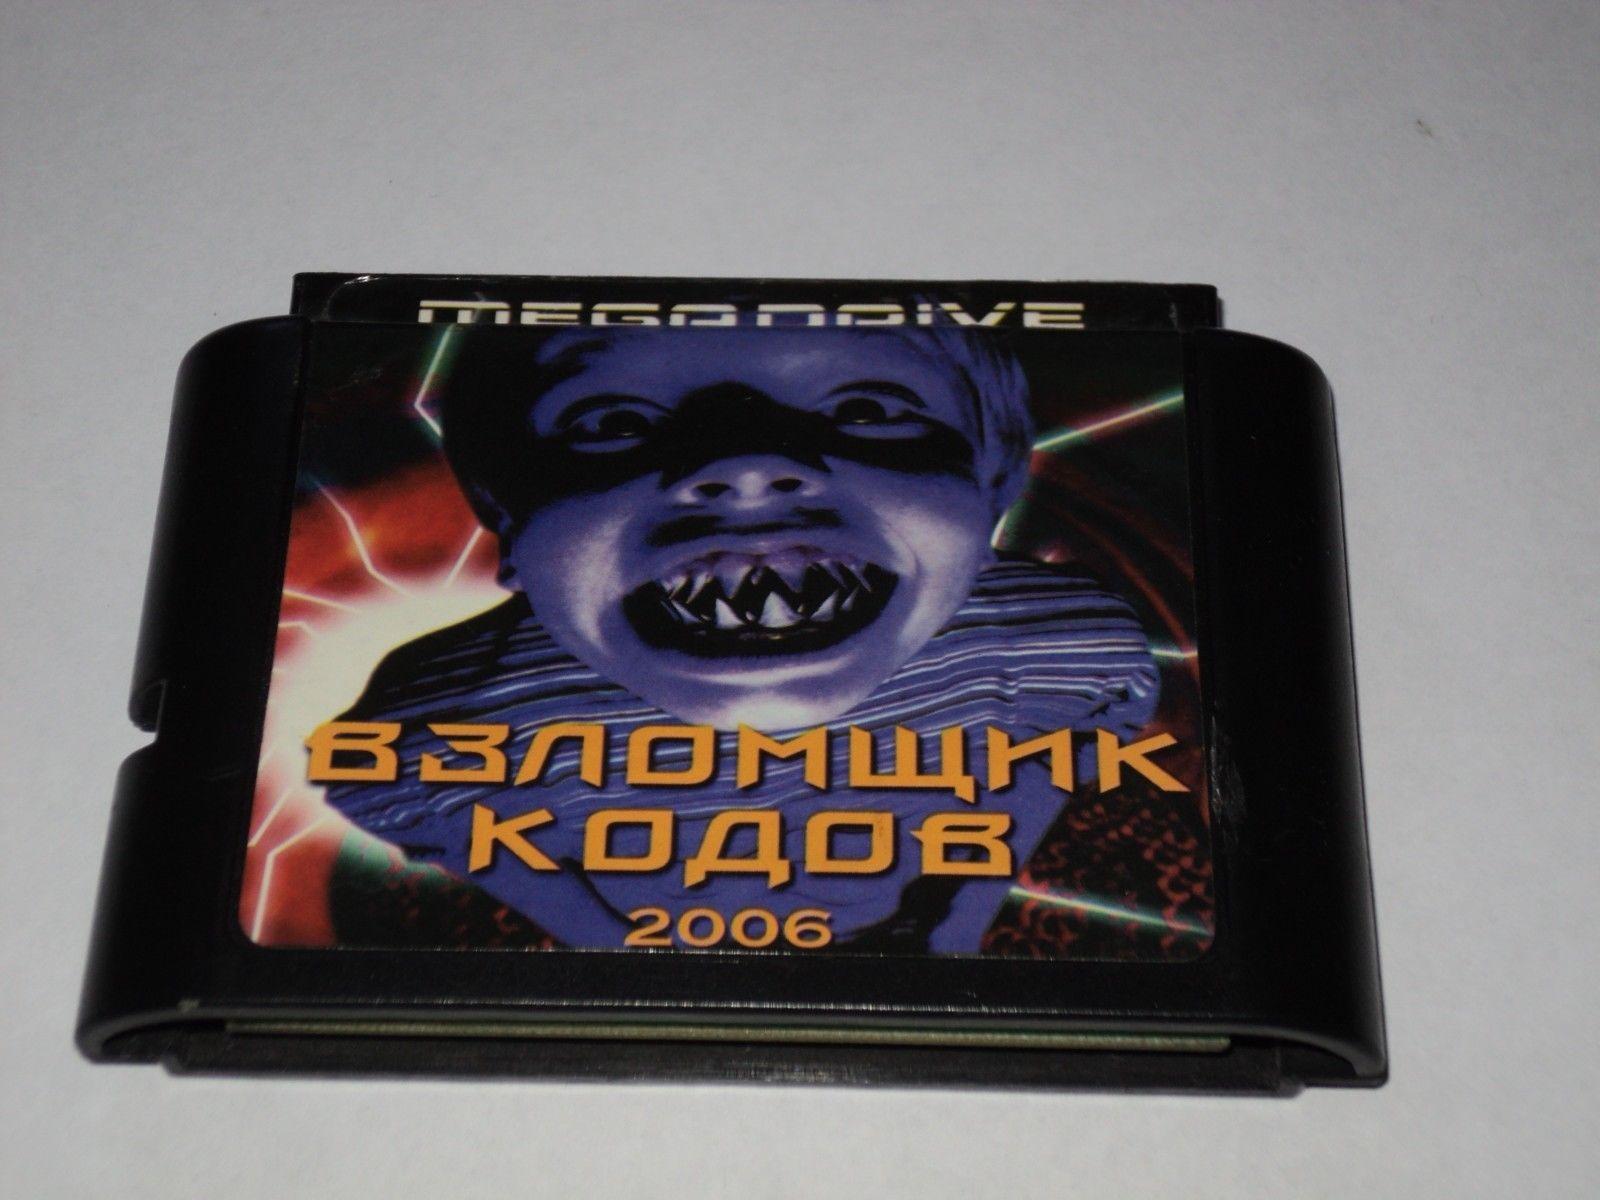 Game Shark 2006